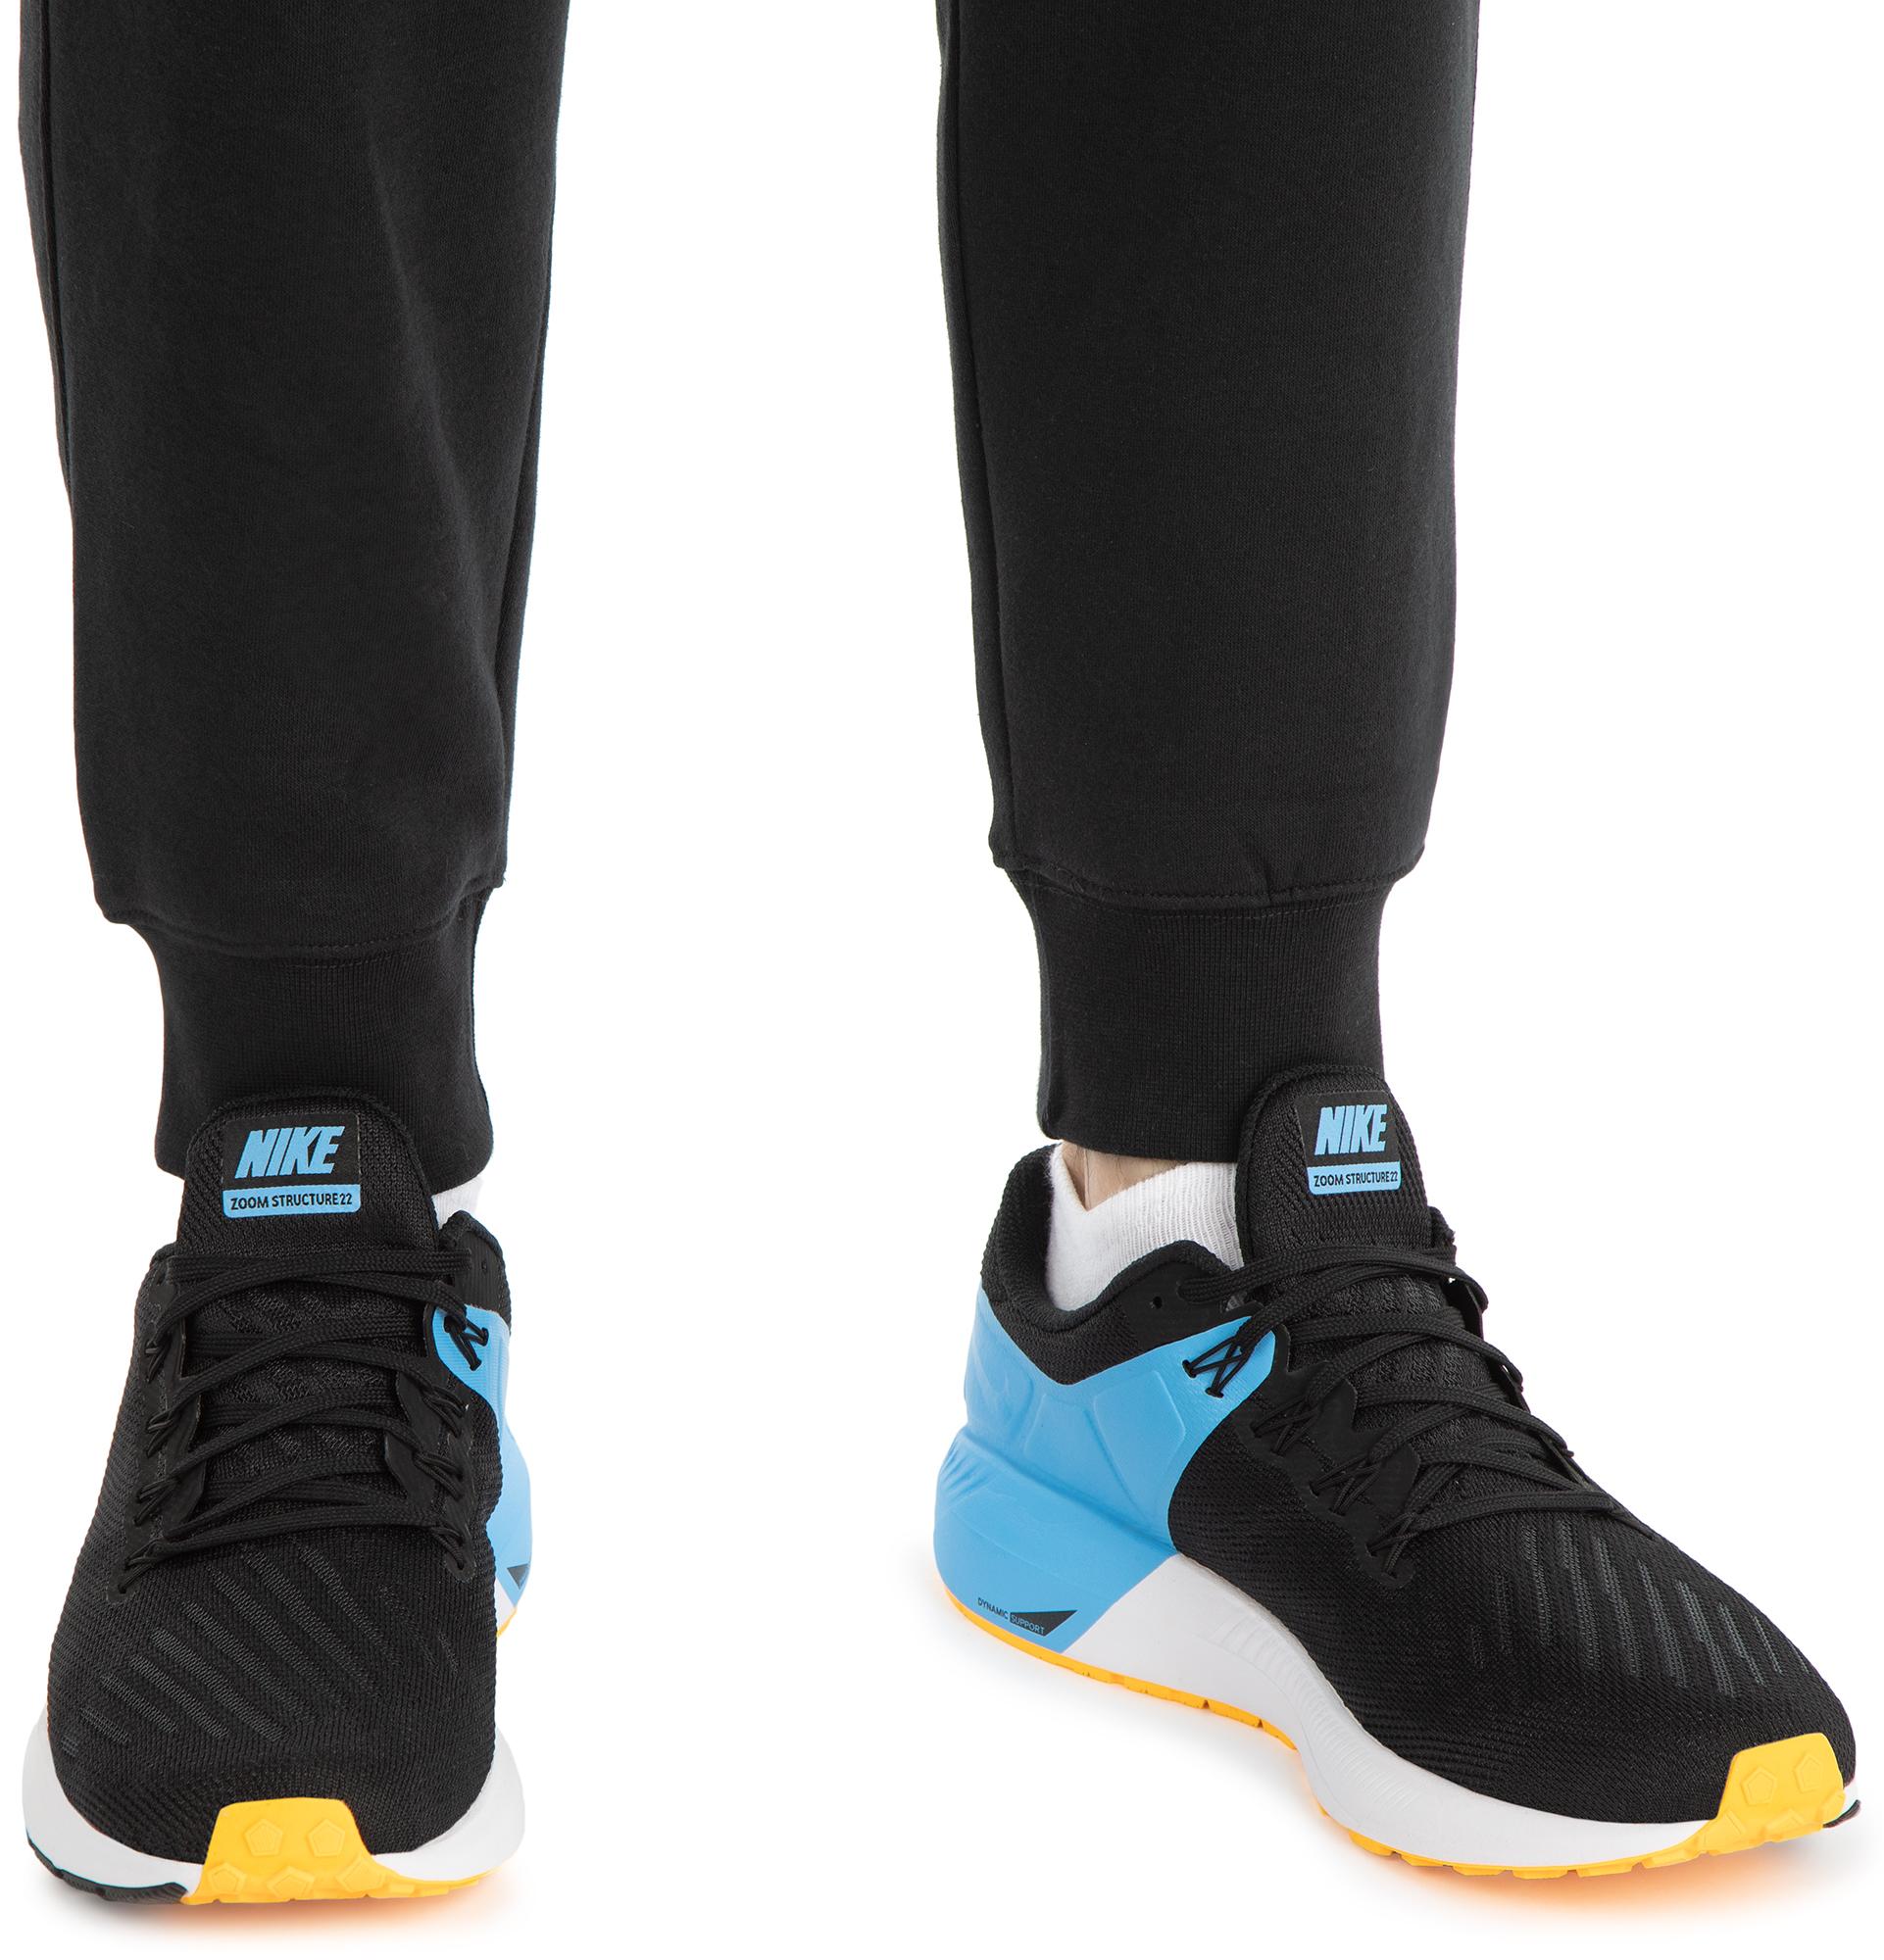 Nike Кроссовки мужские Nike Air Zoom Structure 22, размер 46,5 цена